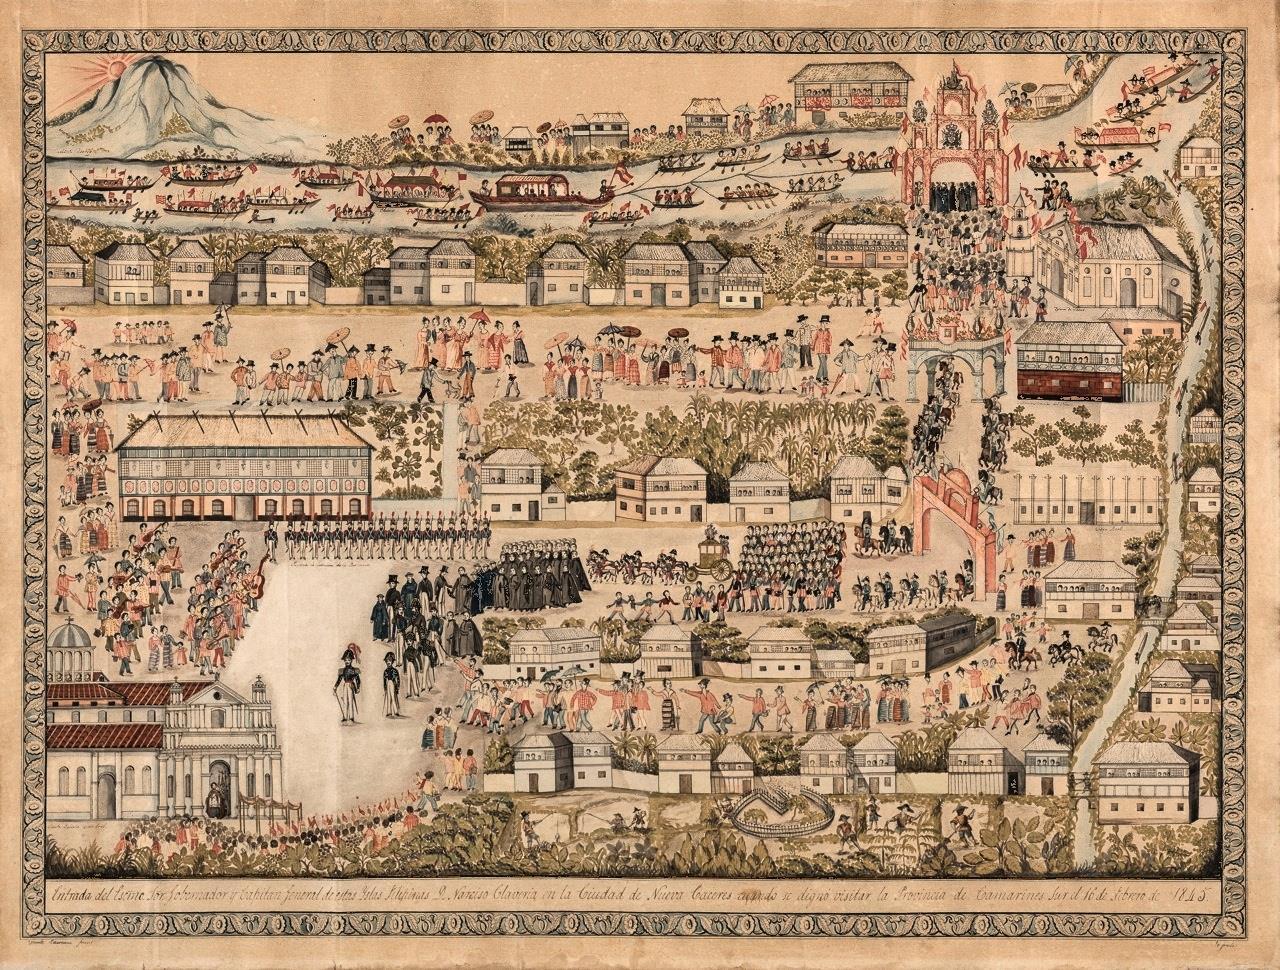 File:Naga City, Camarines Sur 1845 jpg - Wikimedia Commons